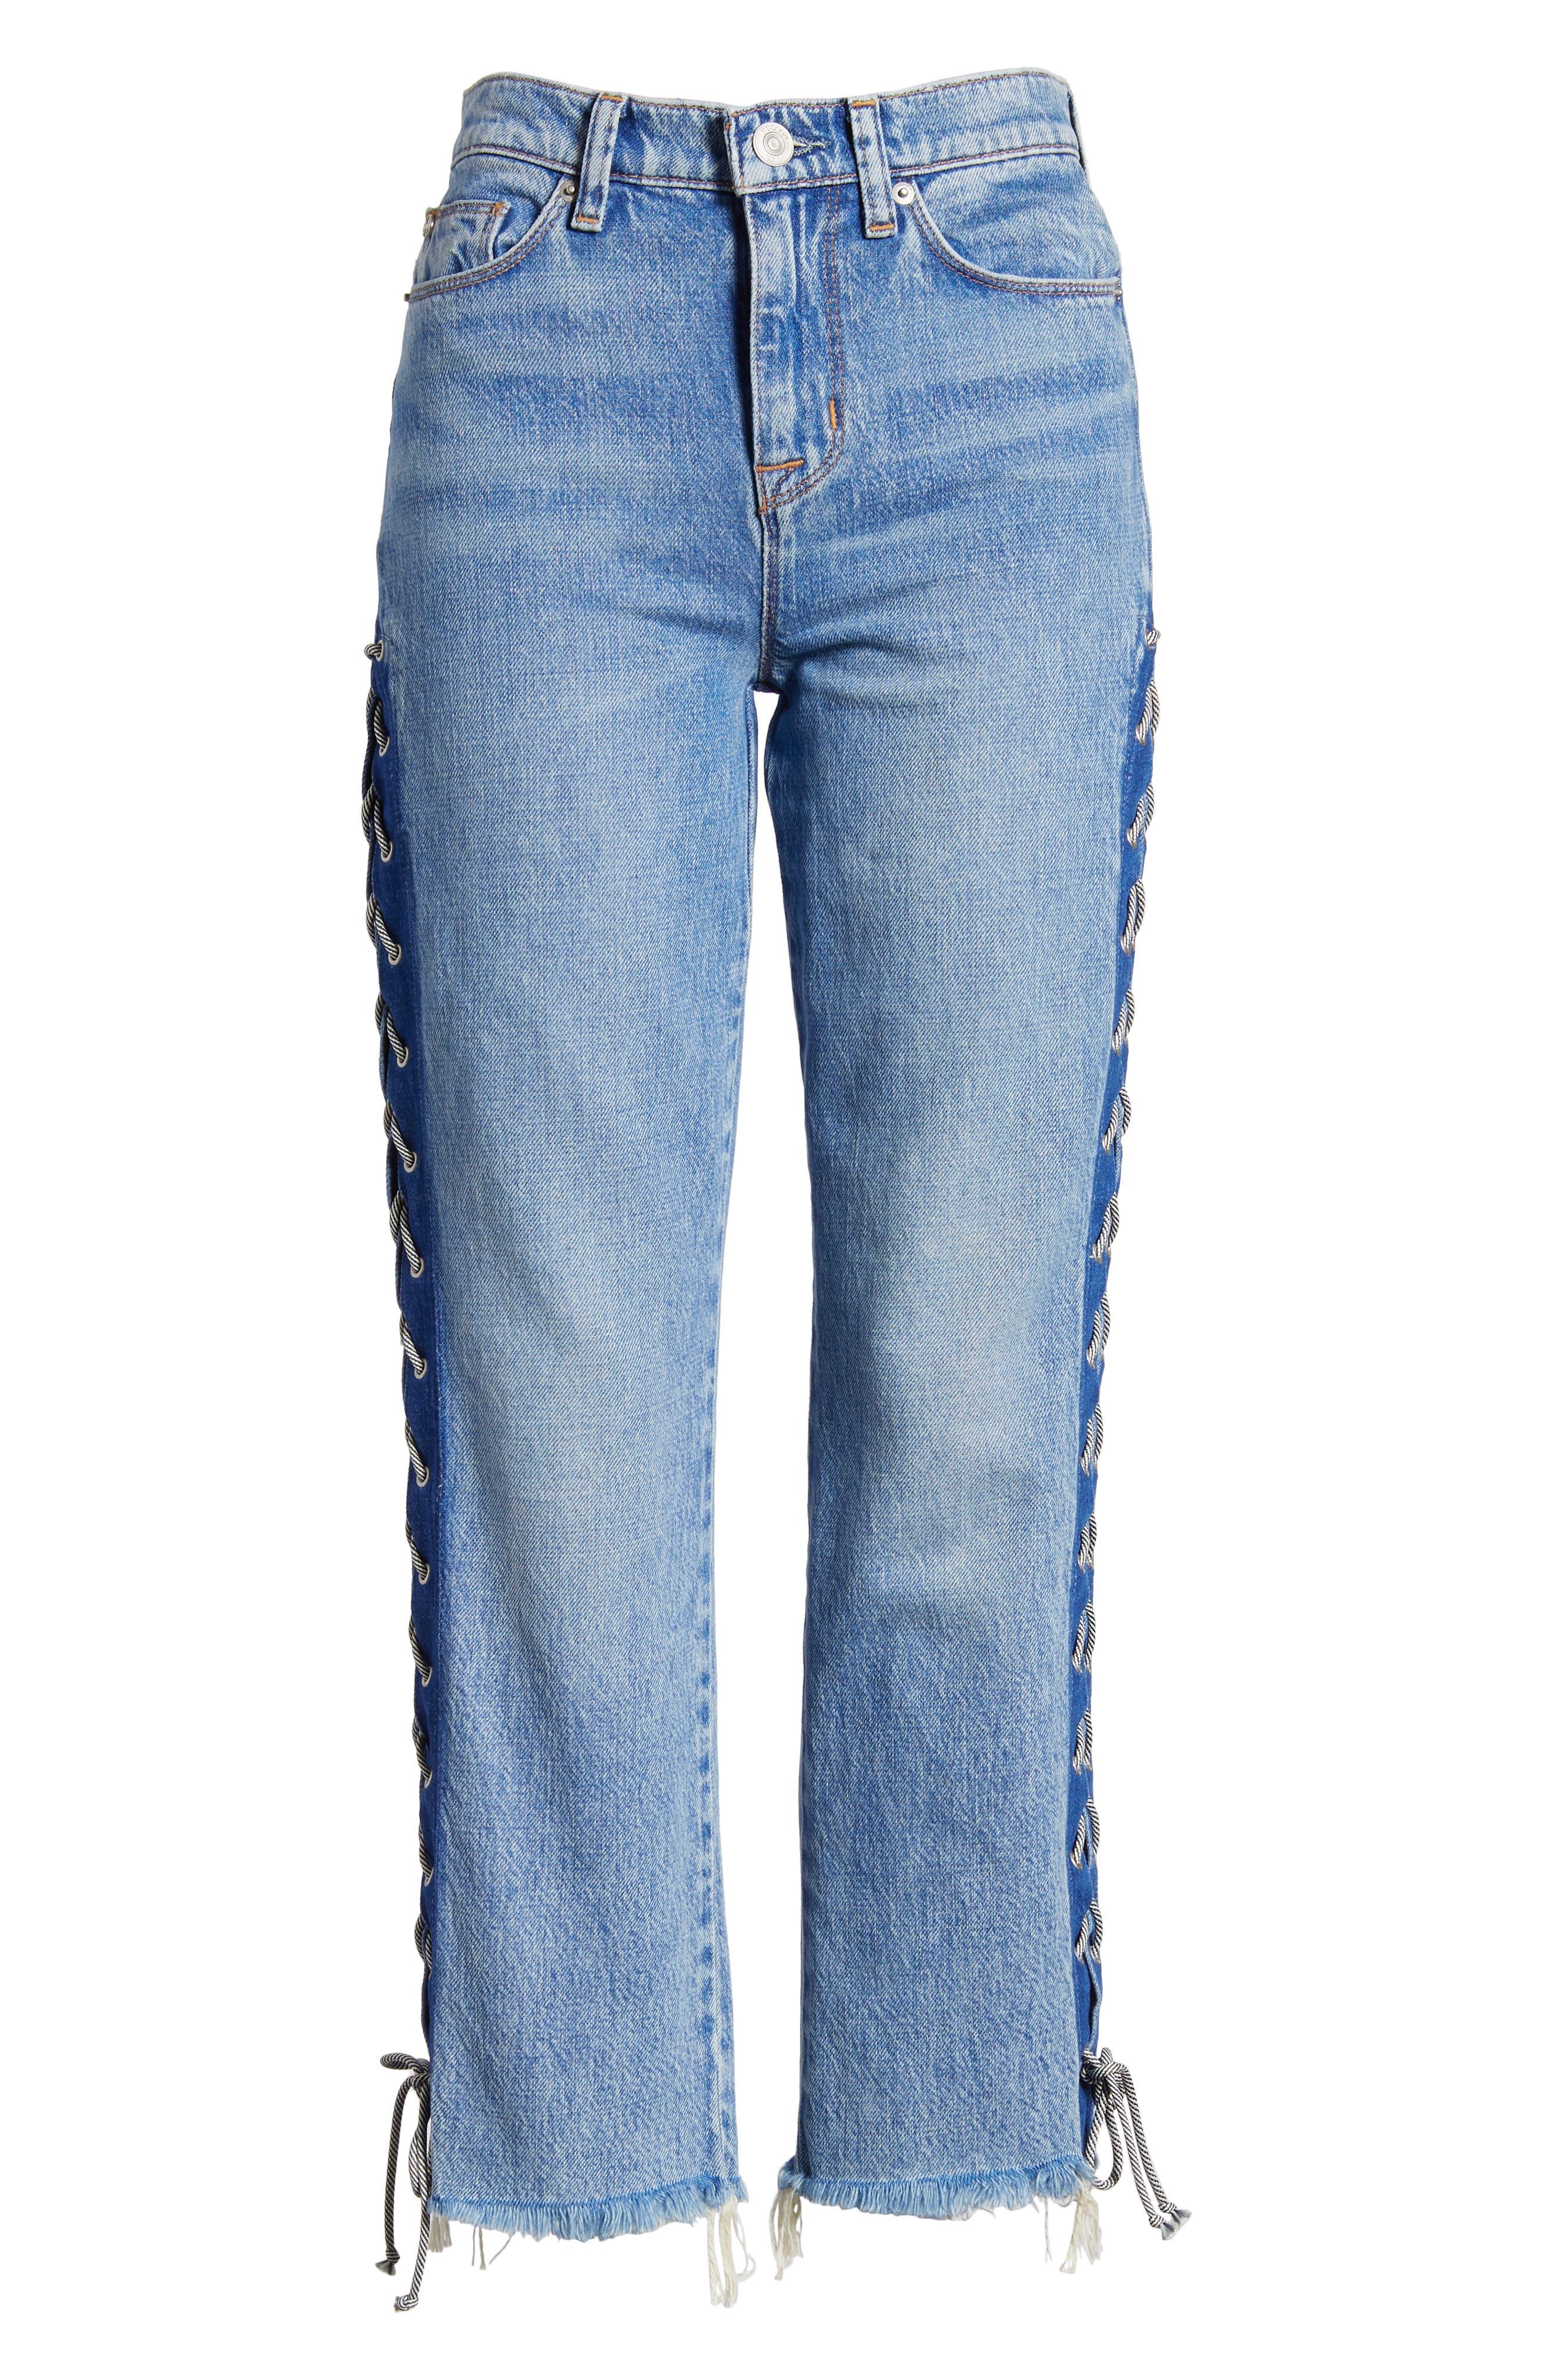 Zoeey High Waist Crop Straight Leg Jeans,                             Alternate thumbnail 7, color,                             460